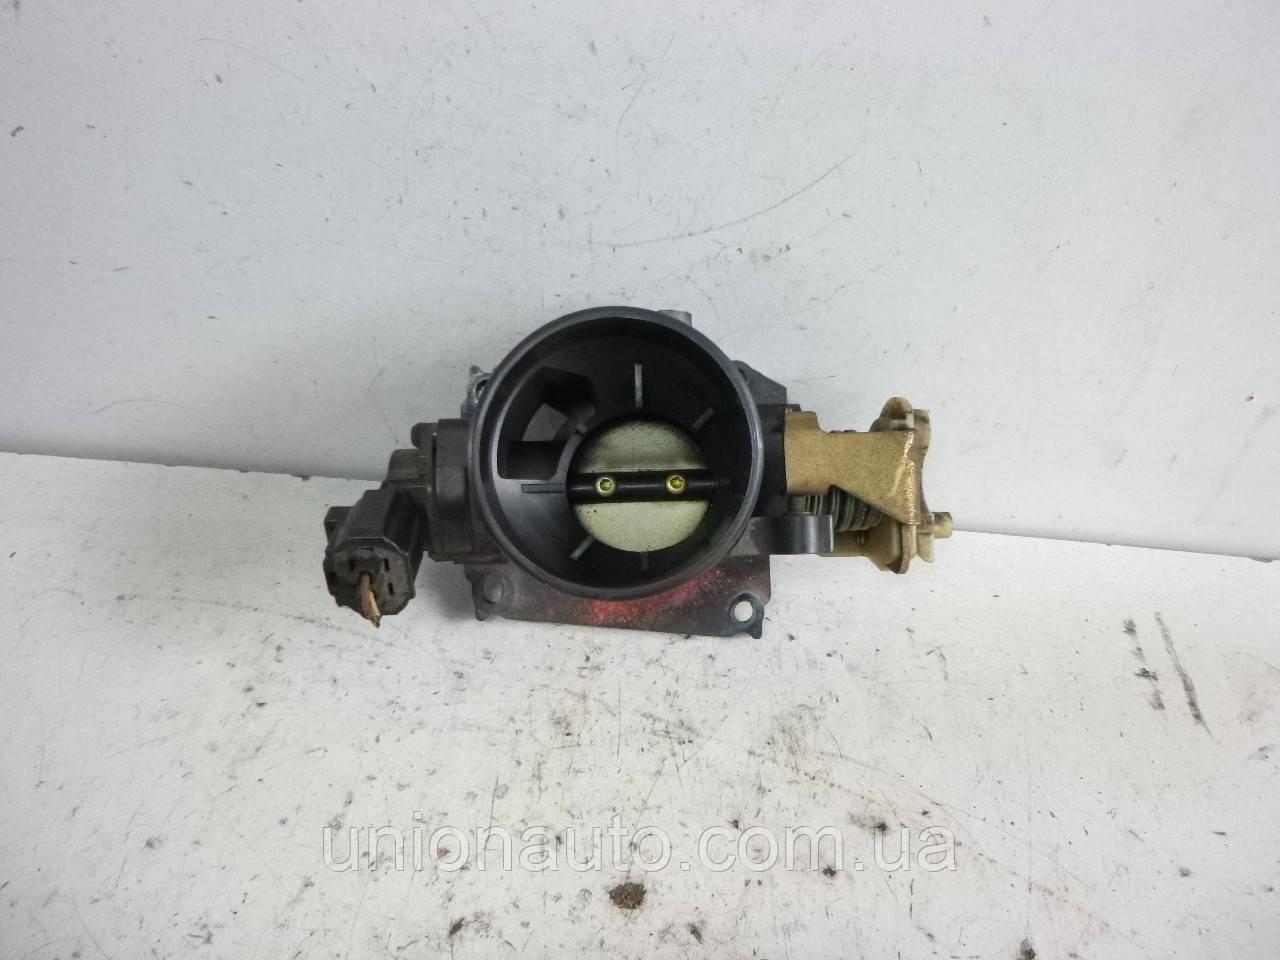 Дросельна заслінка Ford Fiesta IV Lift 1.4 2001р 001118A